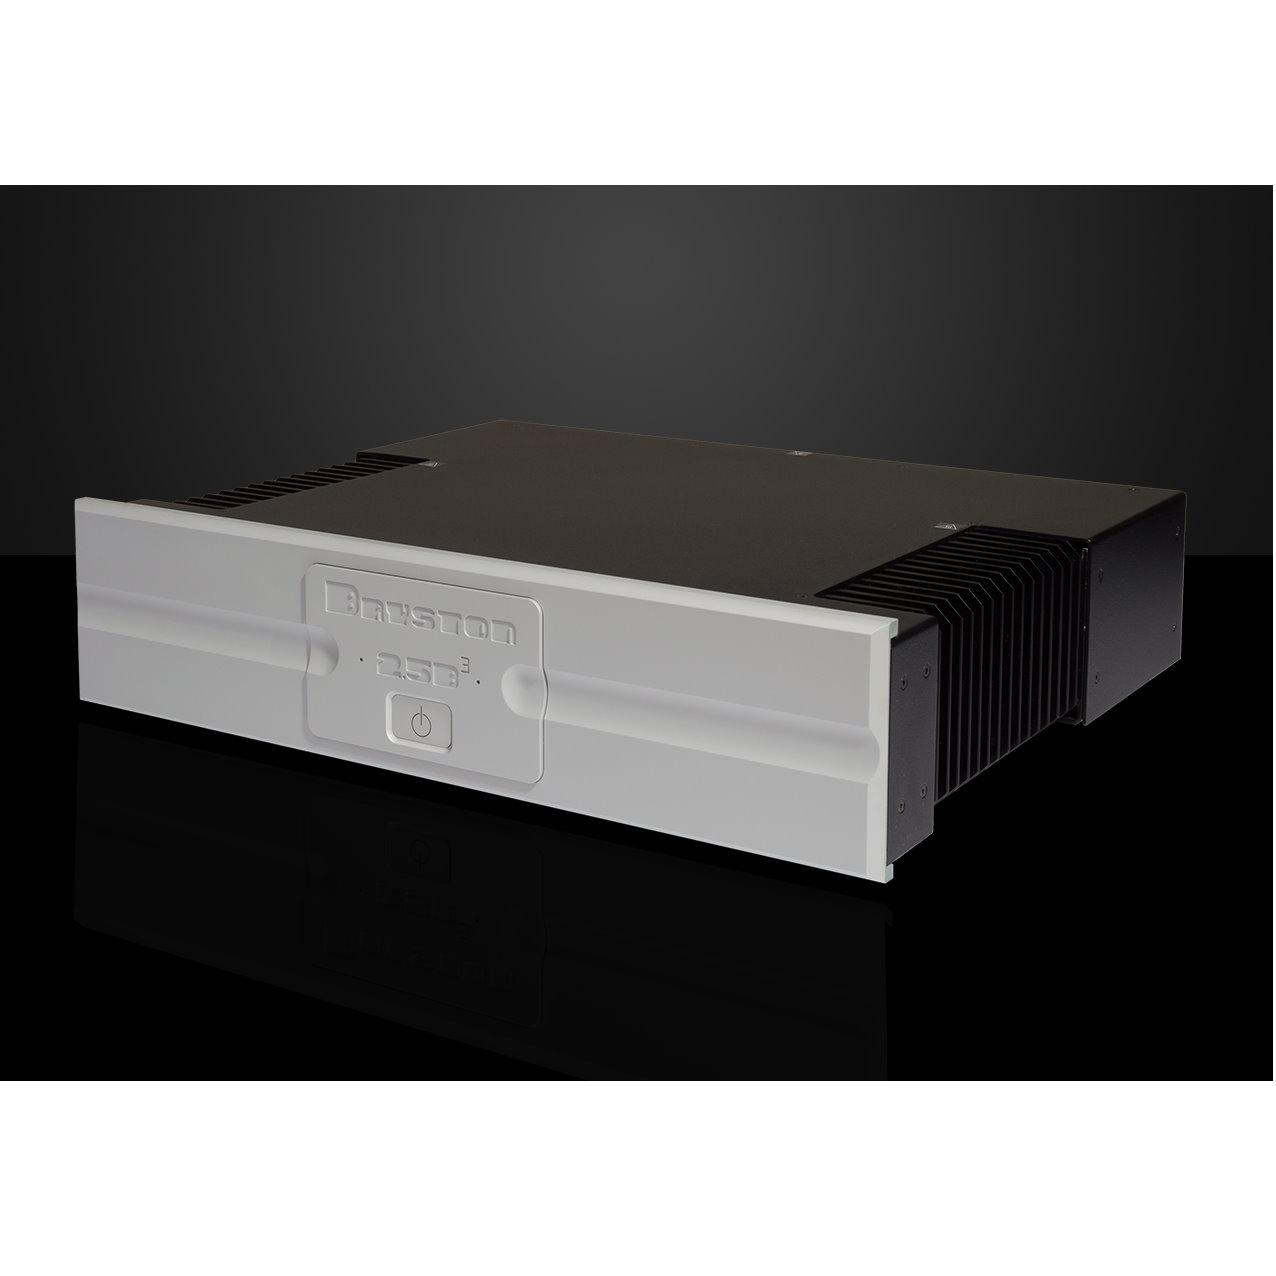 bryston 2 5b cubed stereo power amplifier galen carol audio galen carol audio. Black Bedroom Furniture Sets. Home Design Ideas